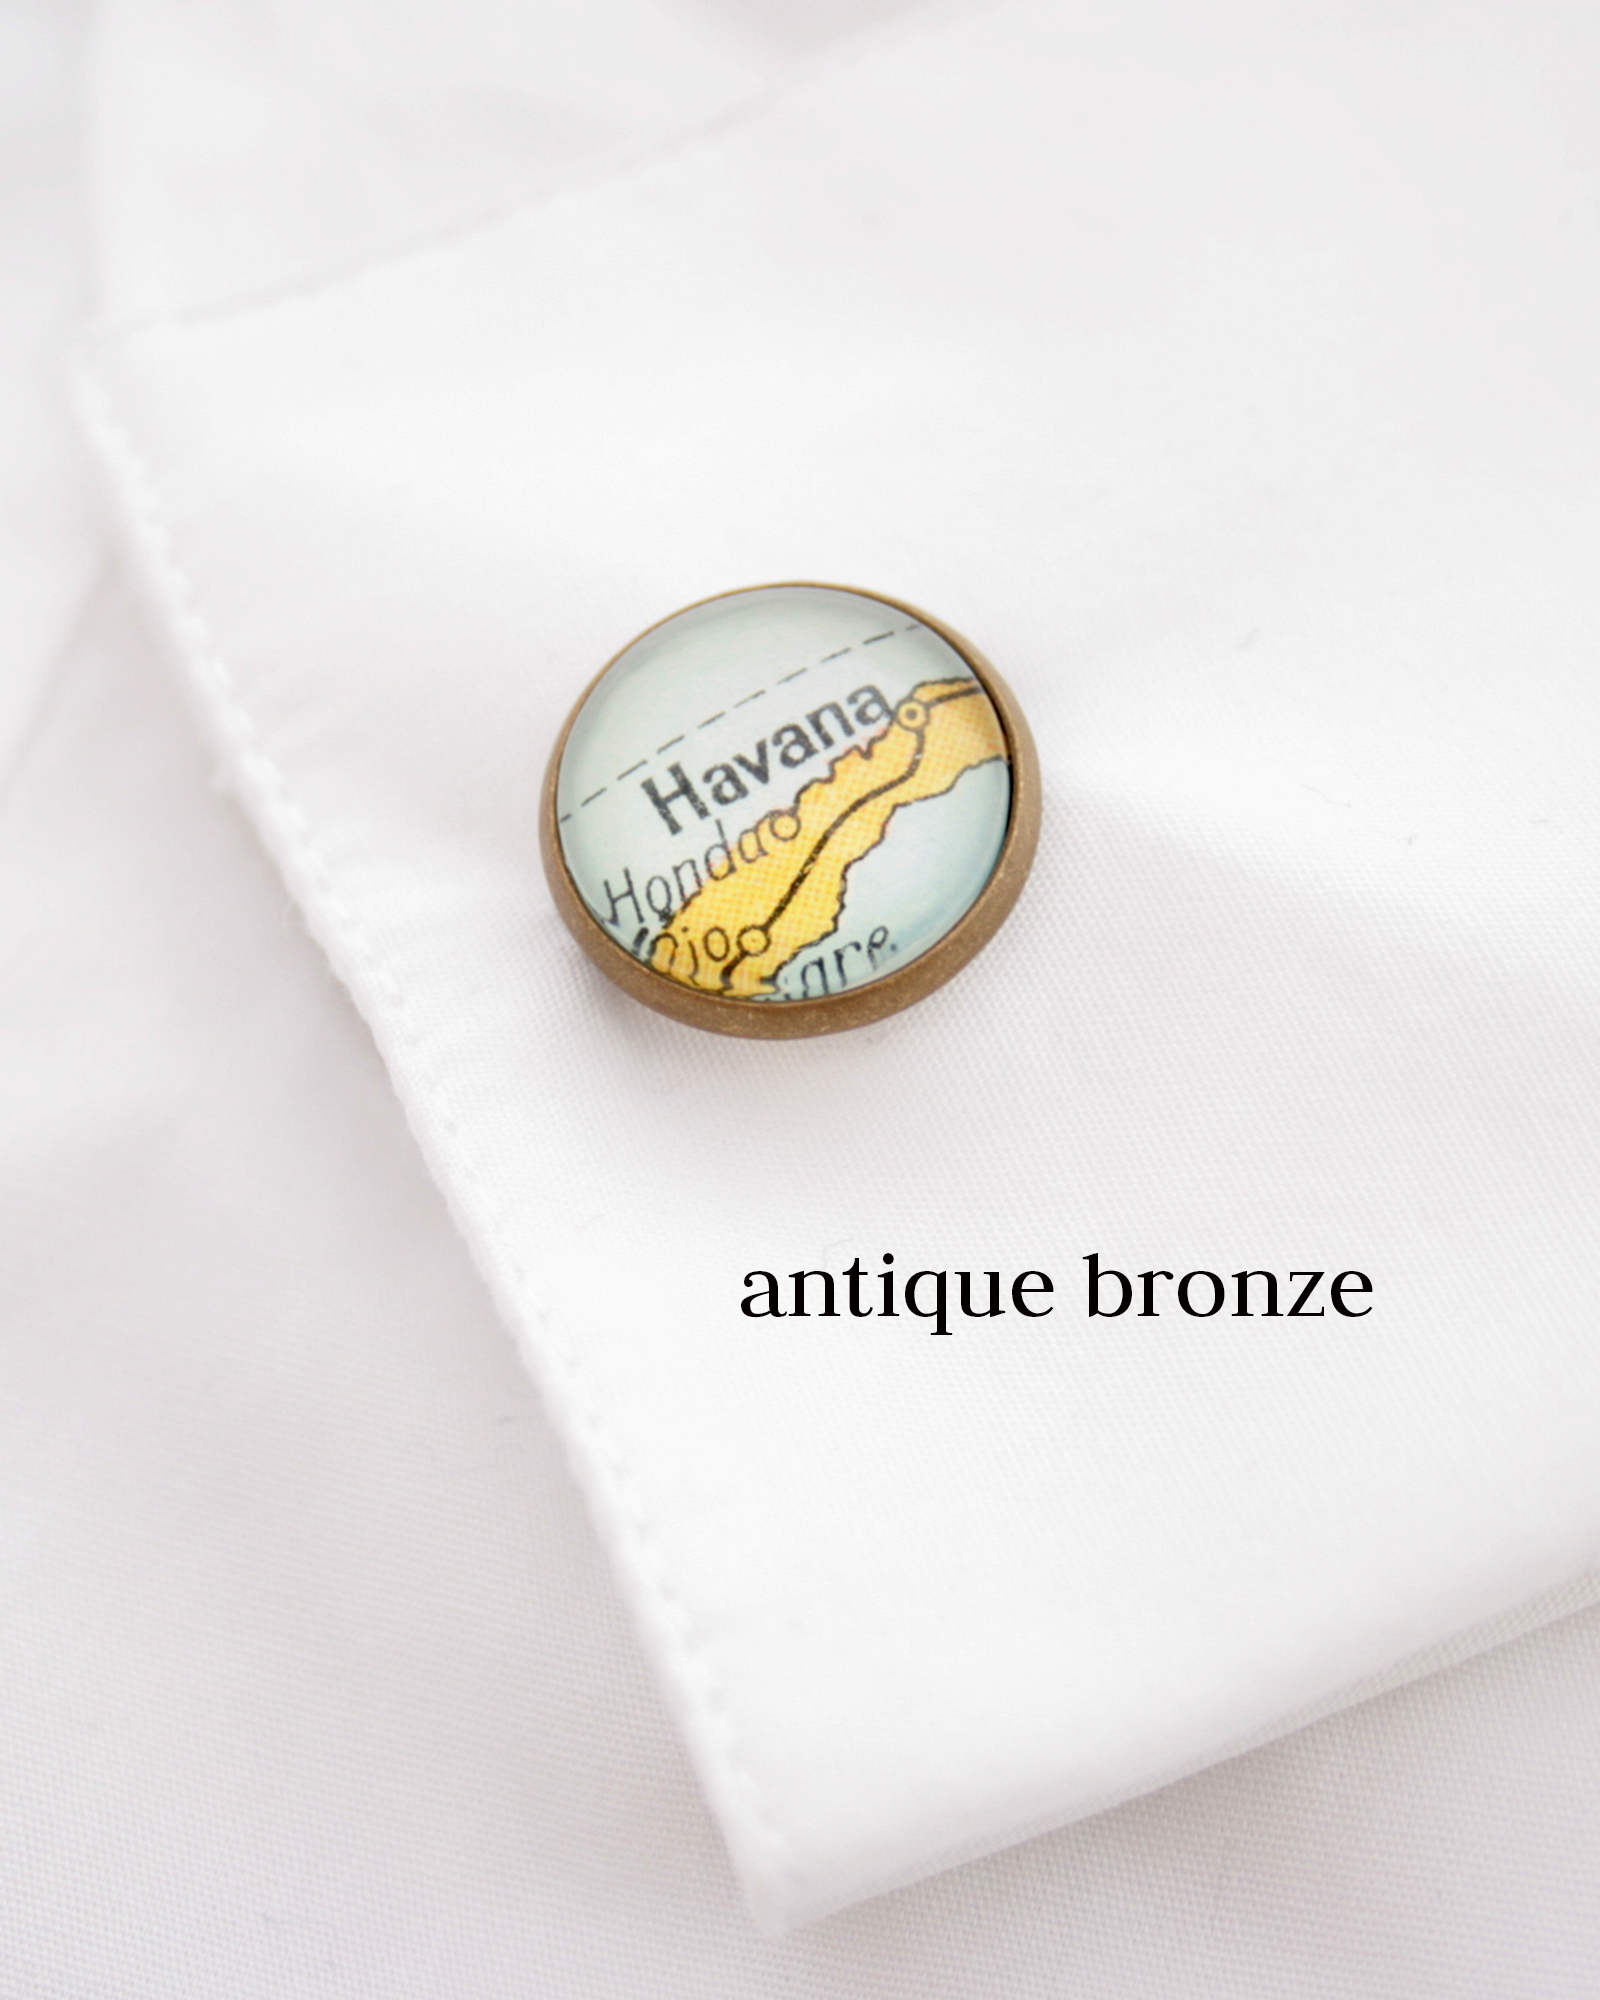 custom map cufflinks in antique bronze colour